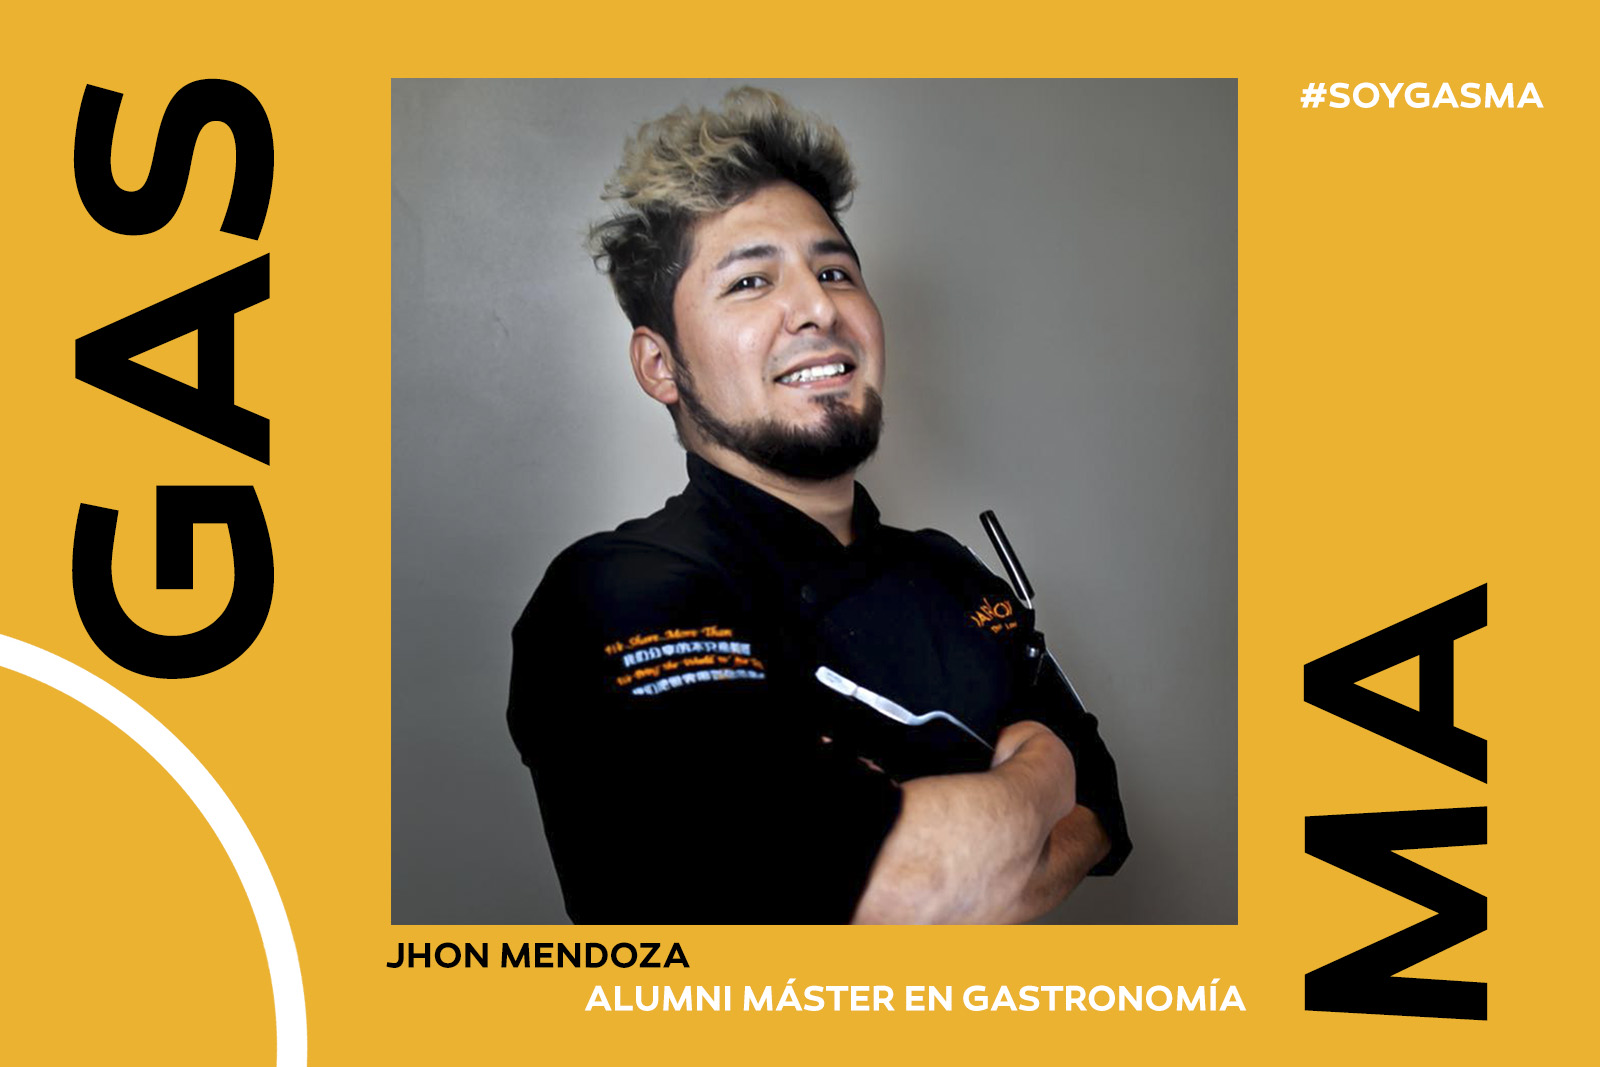 Jhon Mendoza, alumni de Gasma